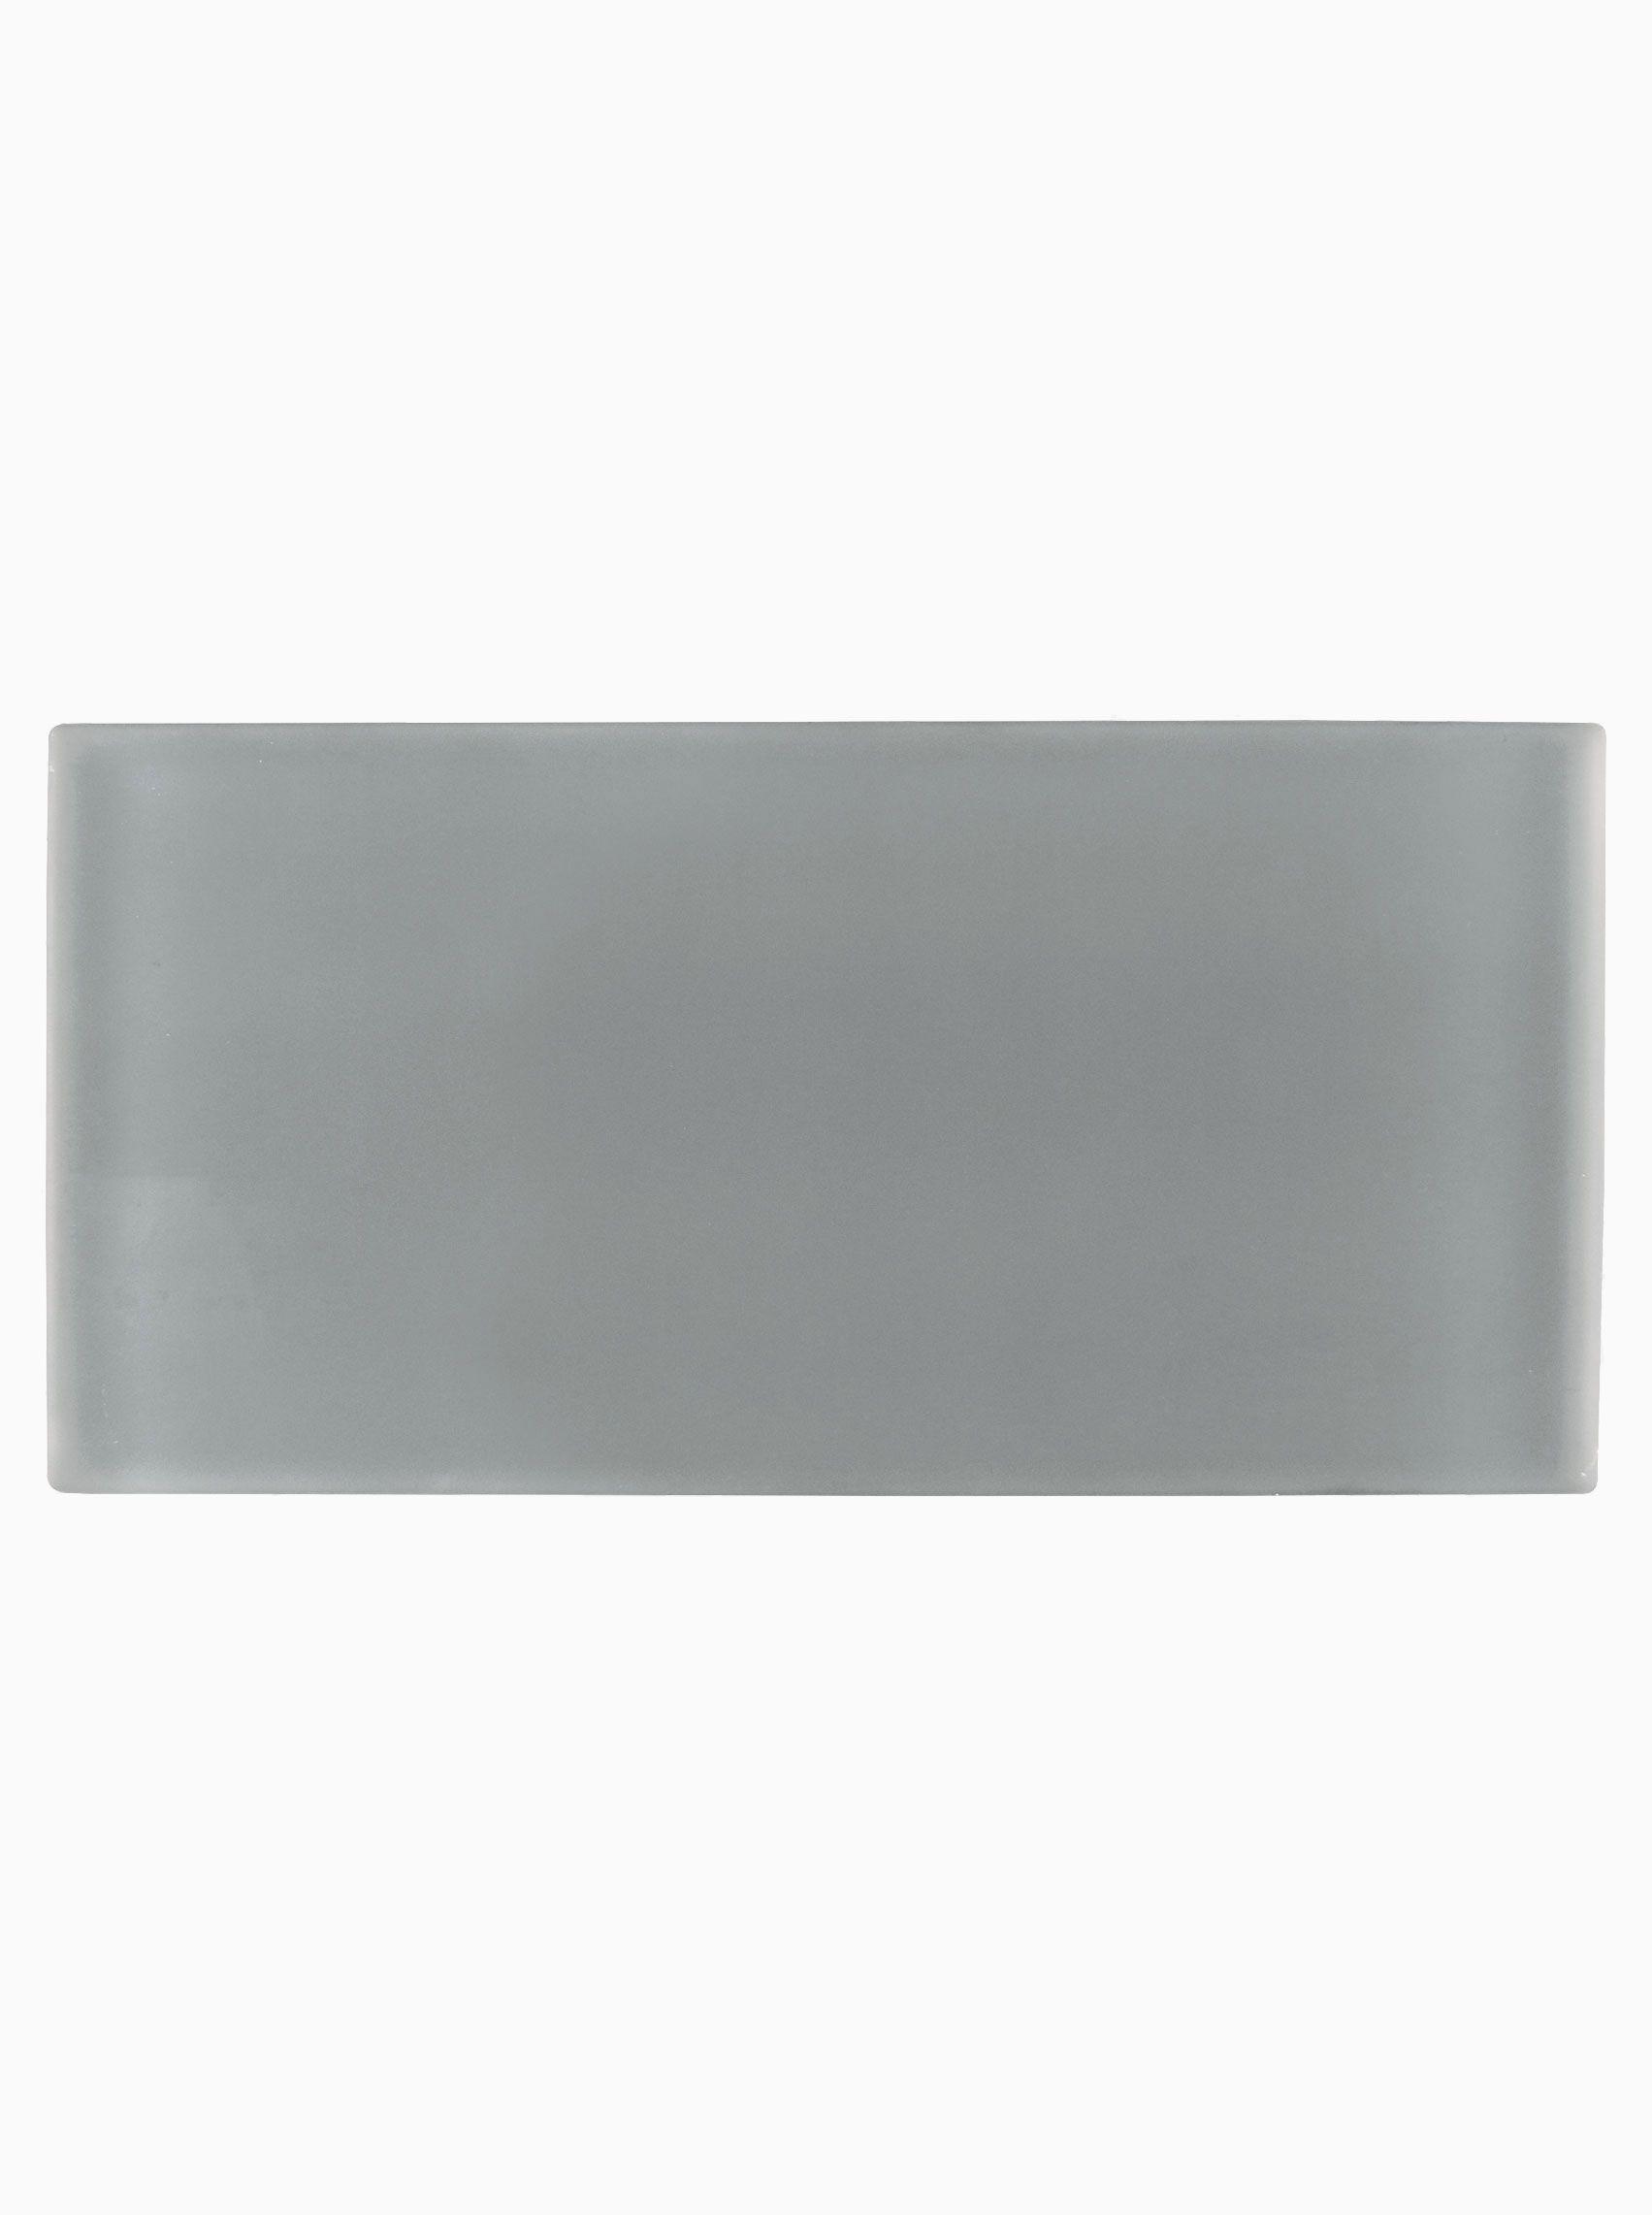 Byzantine Platinum 7.5x15